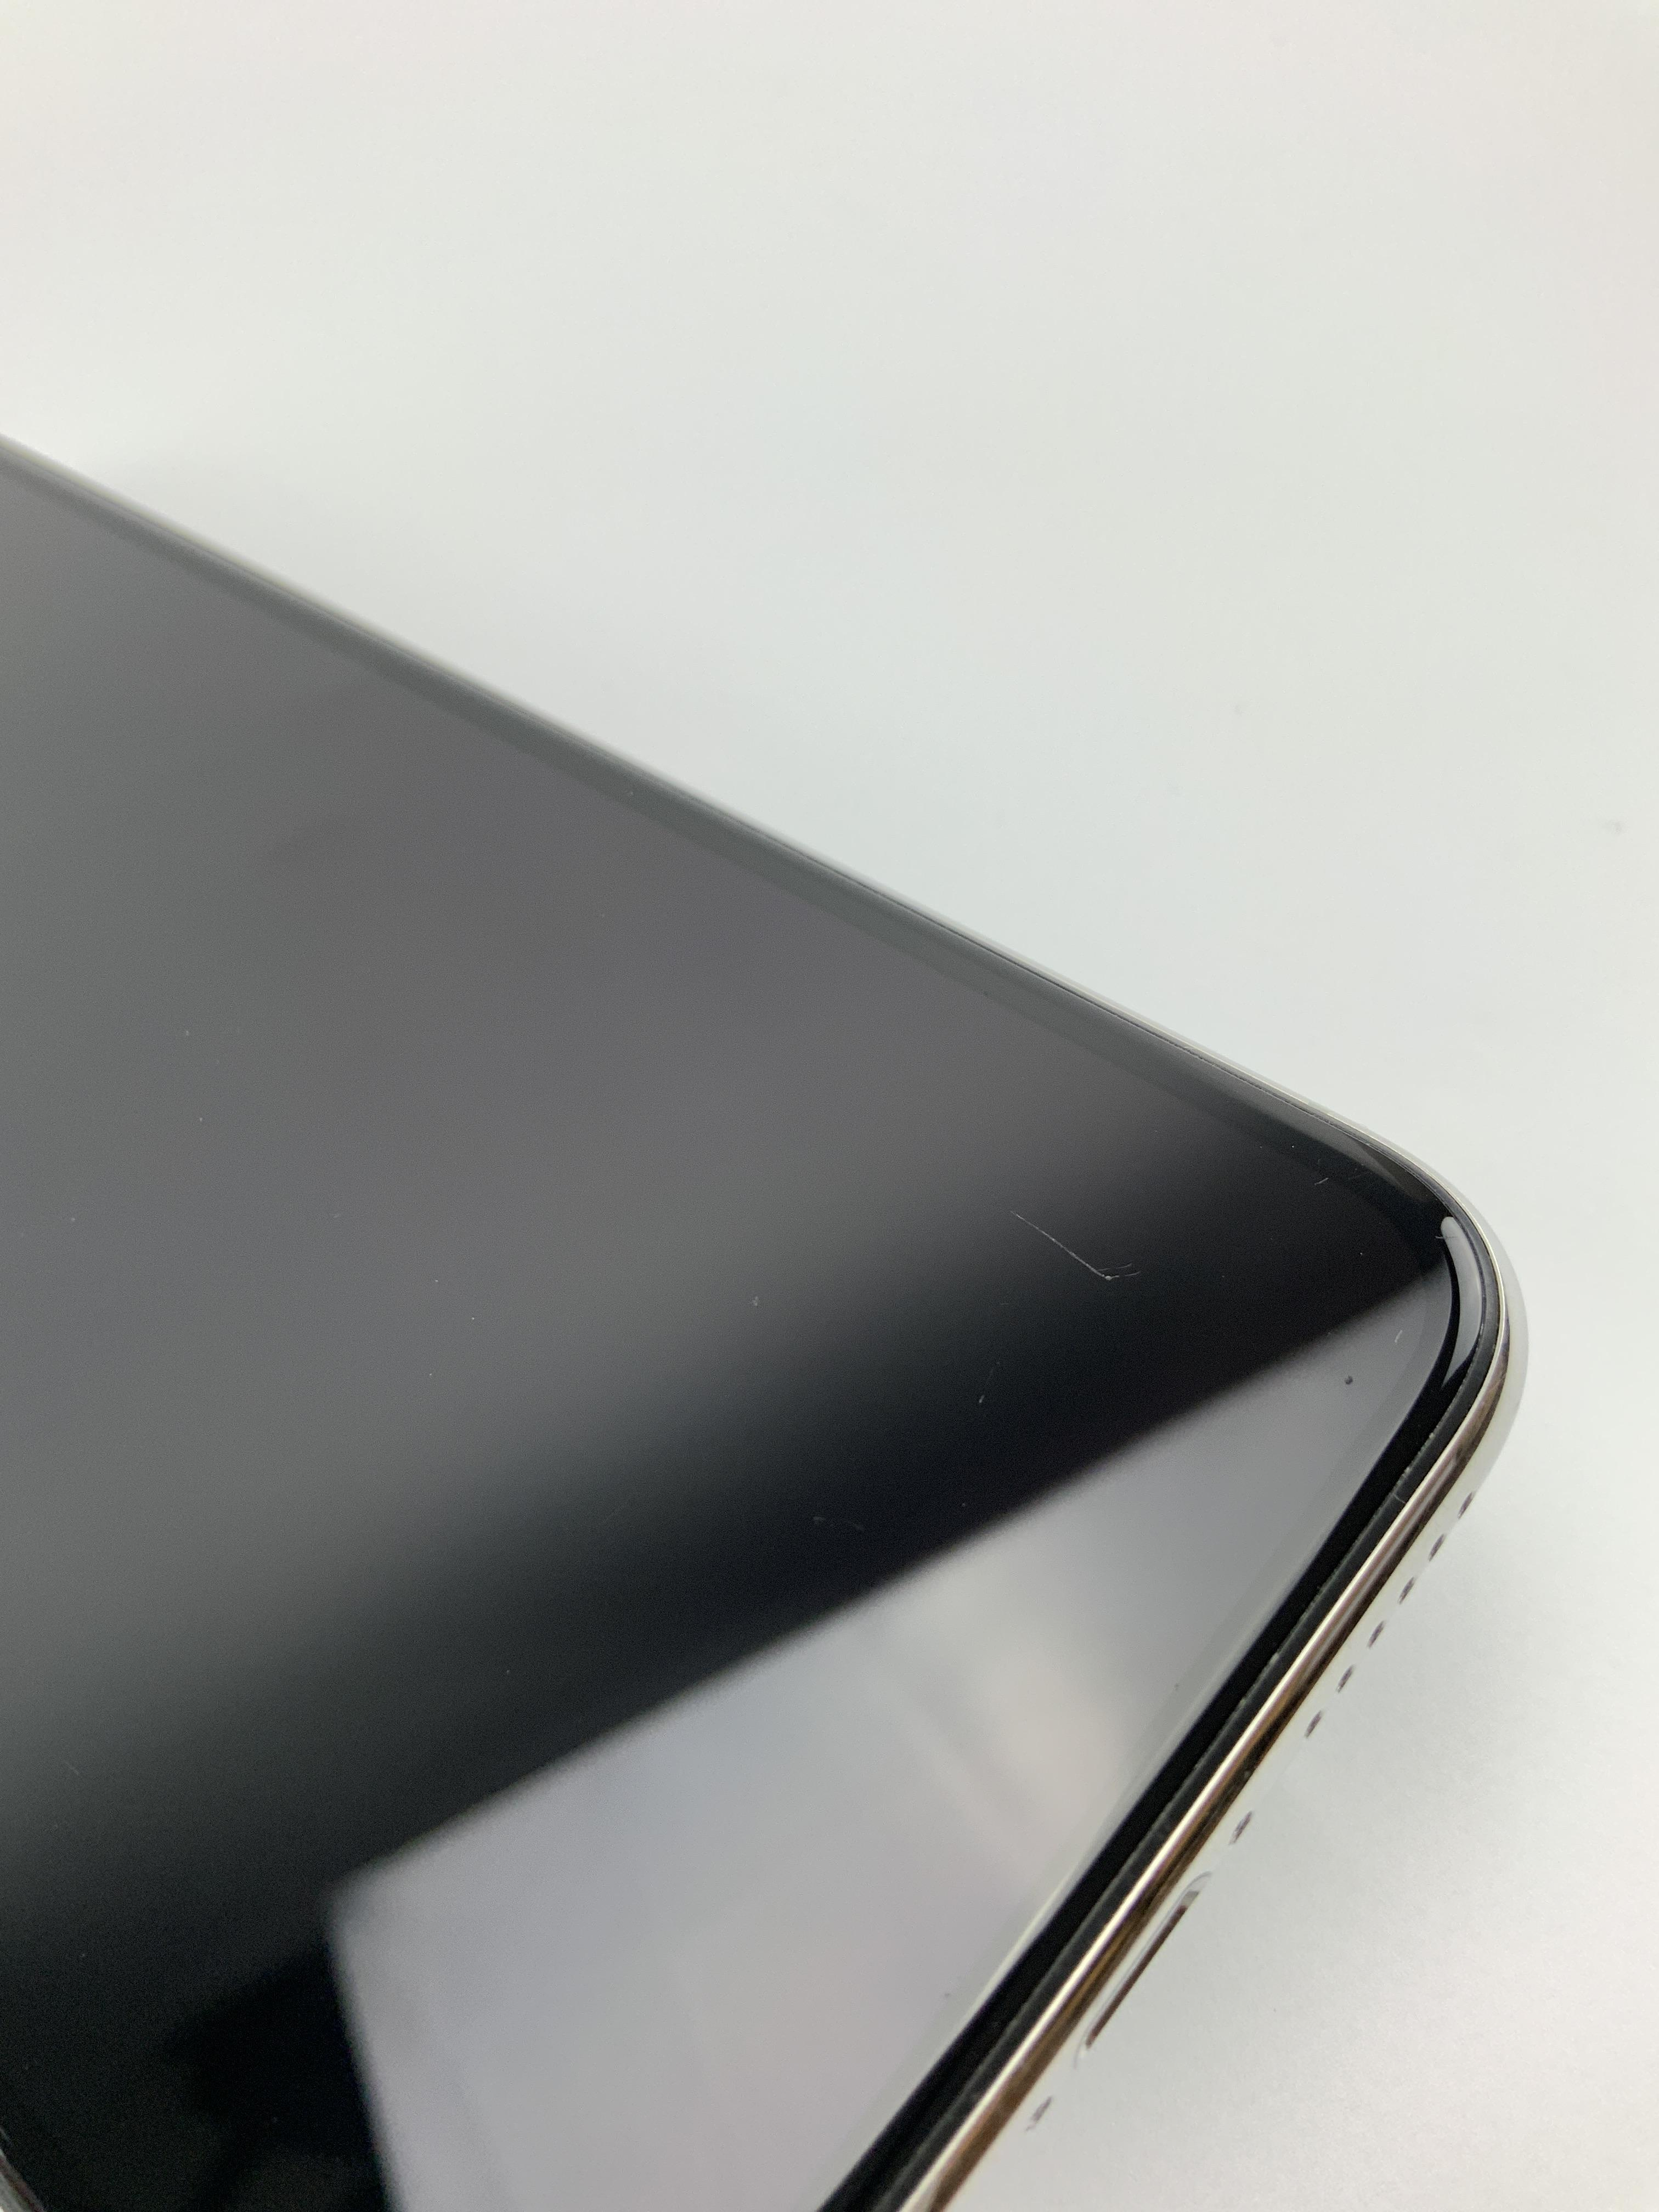 iPhone 11 Pro 256GB, 256GB, Silver, imagen 4